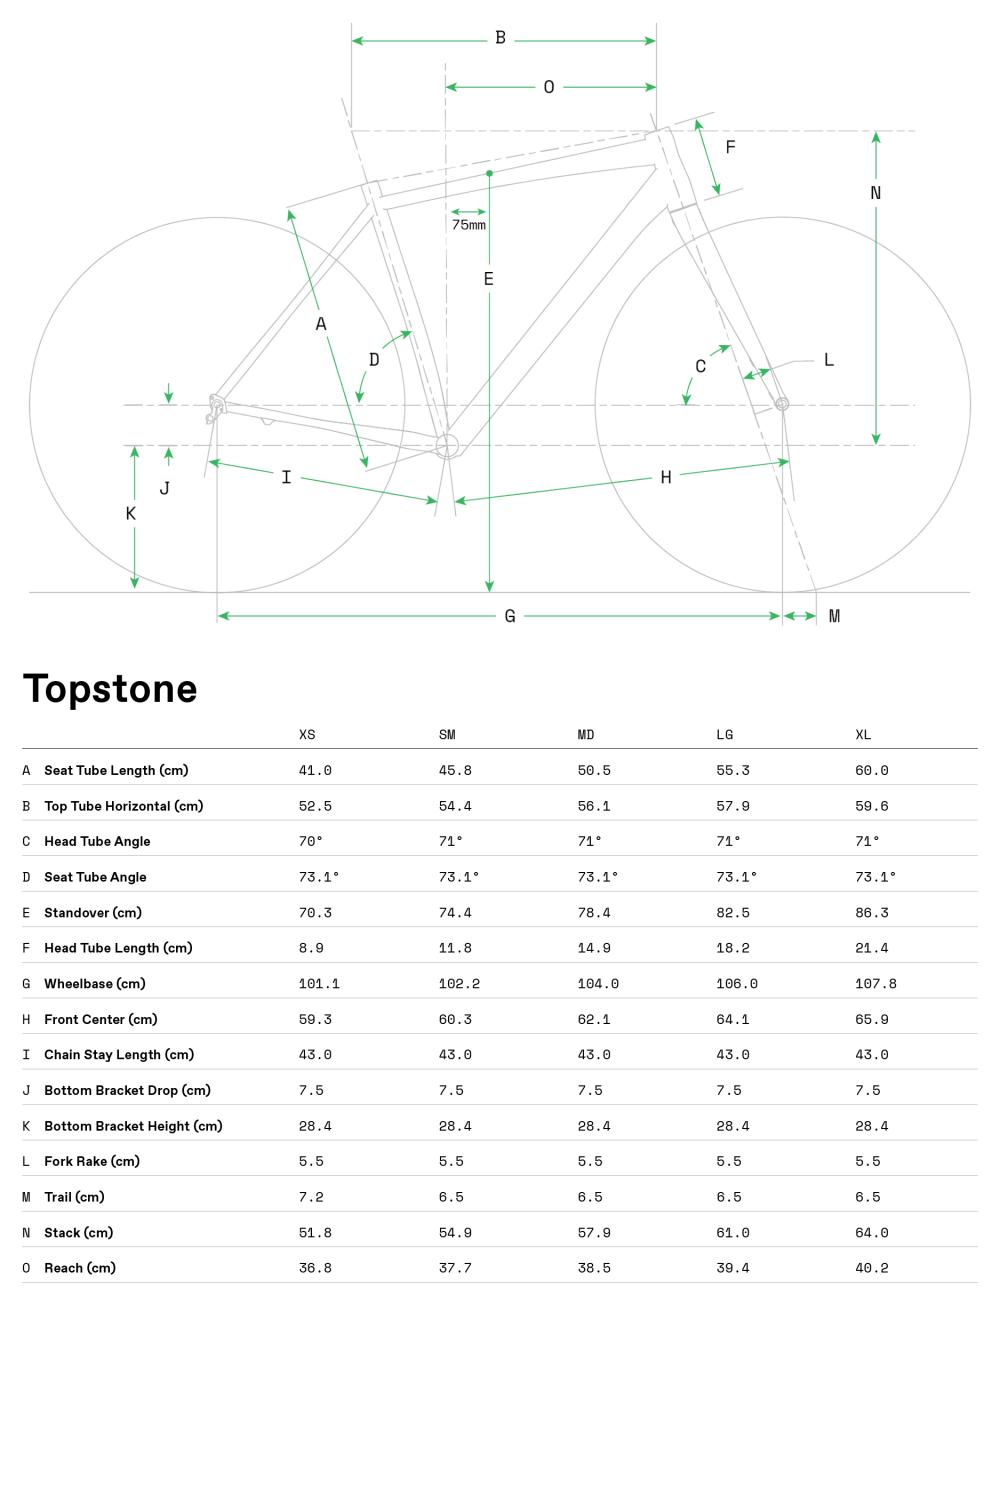 Topstone 1 -